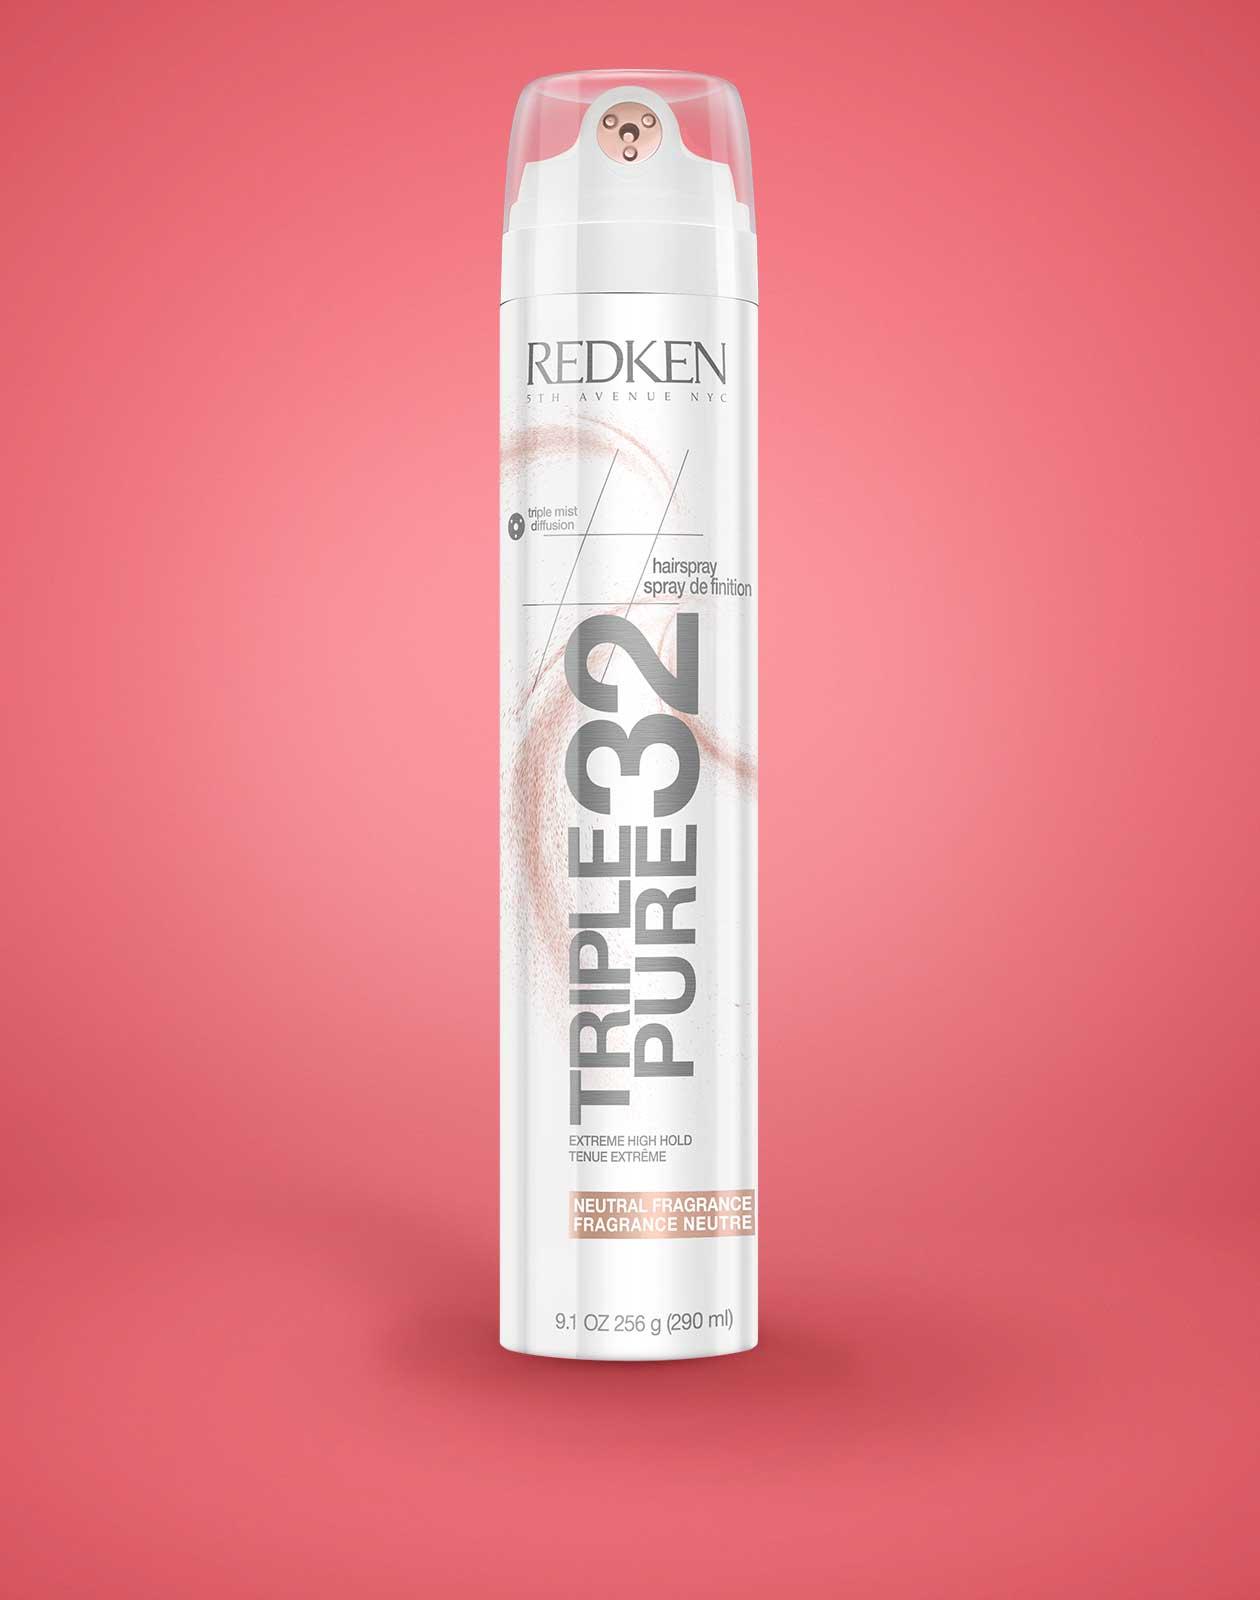 redken triple pure 32 hairspray